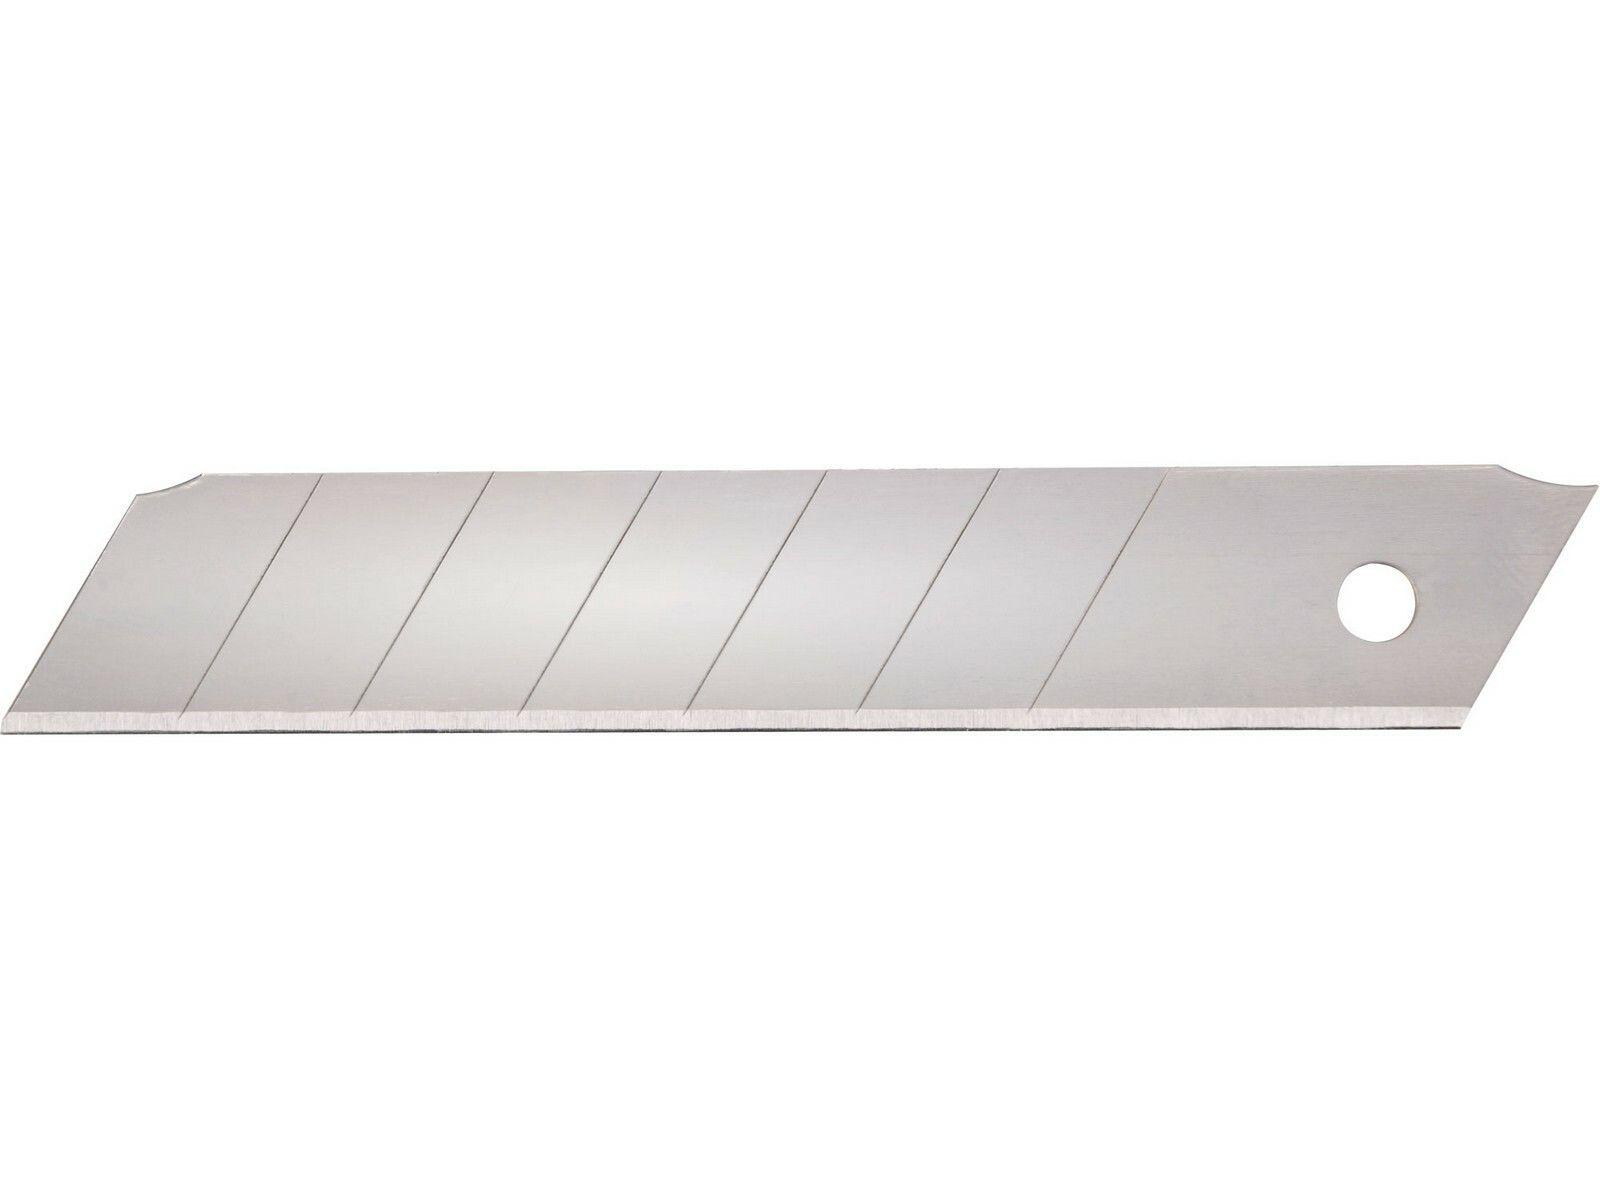 Břity ulamovací do nože, 25mm, 10ks, SK4 EXTOL PREMIUM